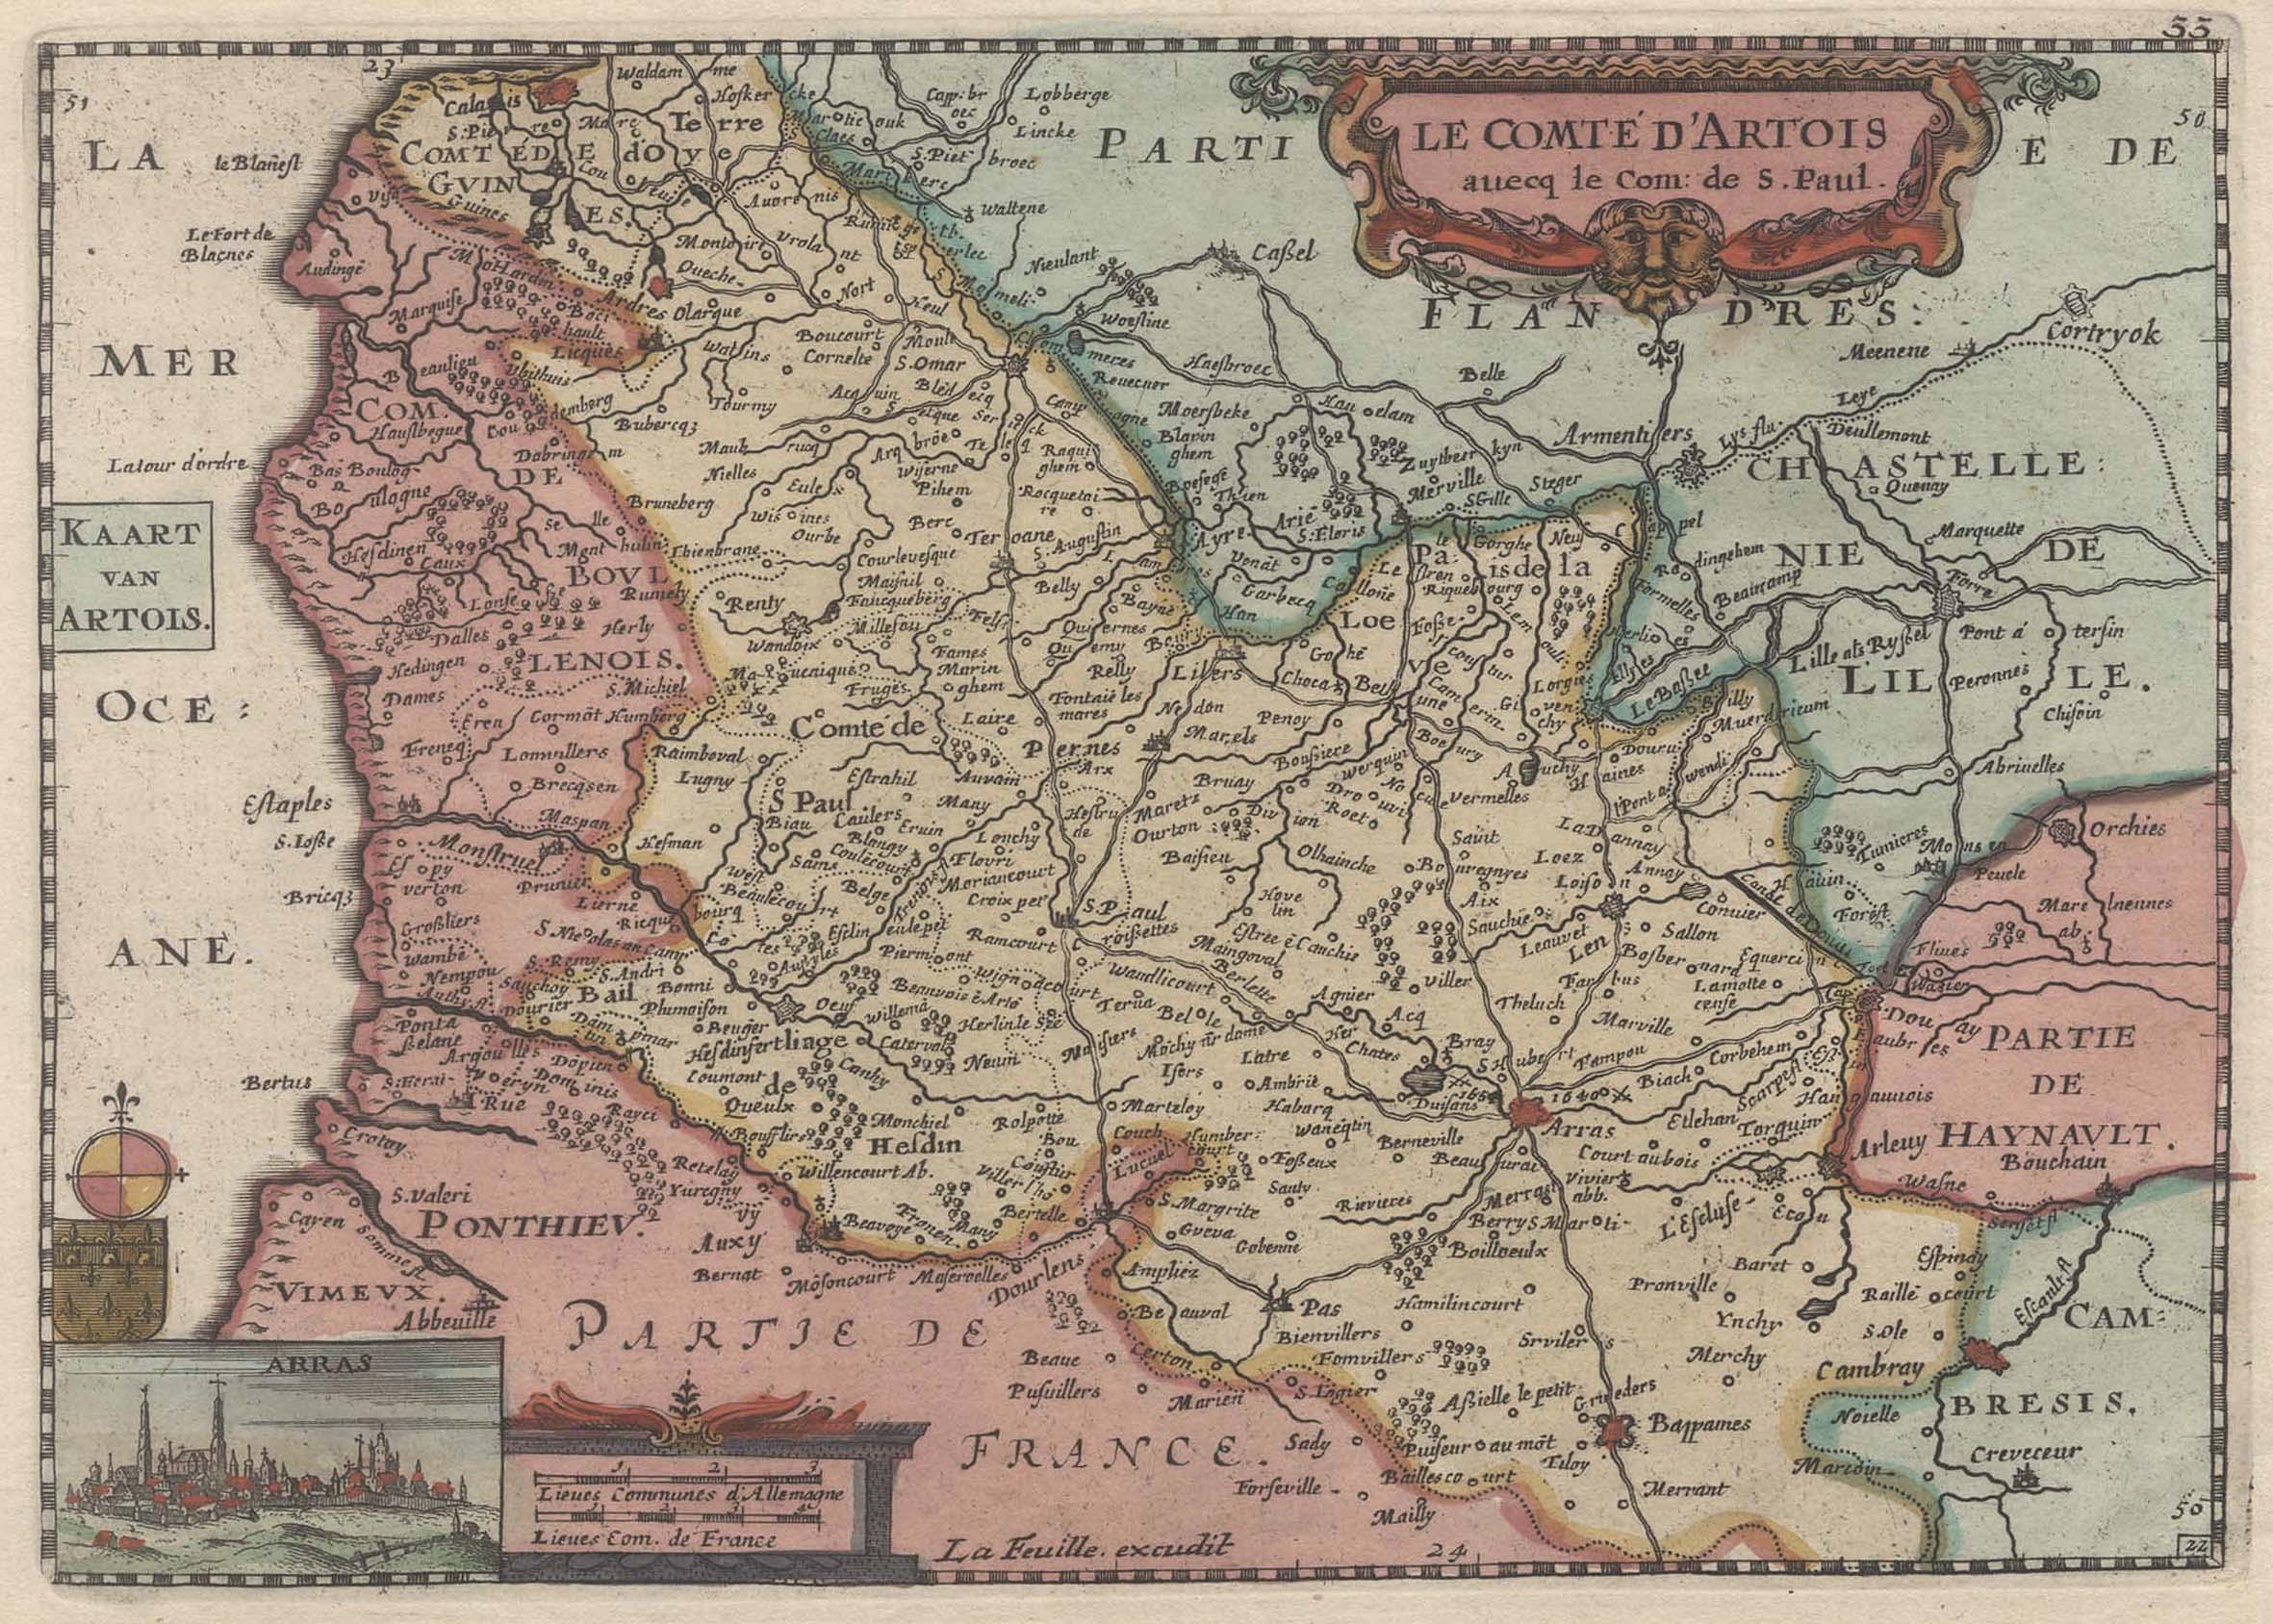 Kst.- Karte, v. Daniel de La Feuille,: Artois: